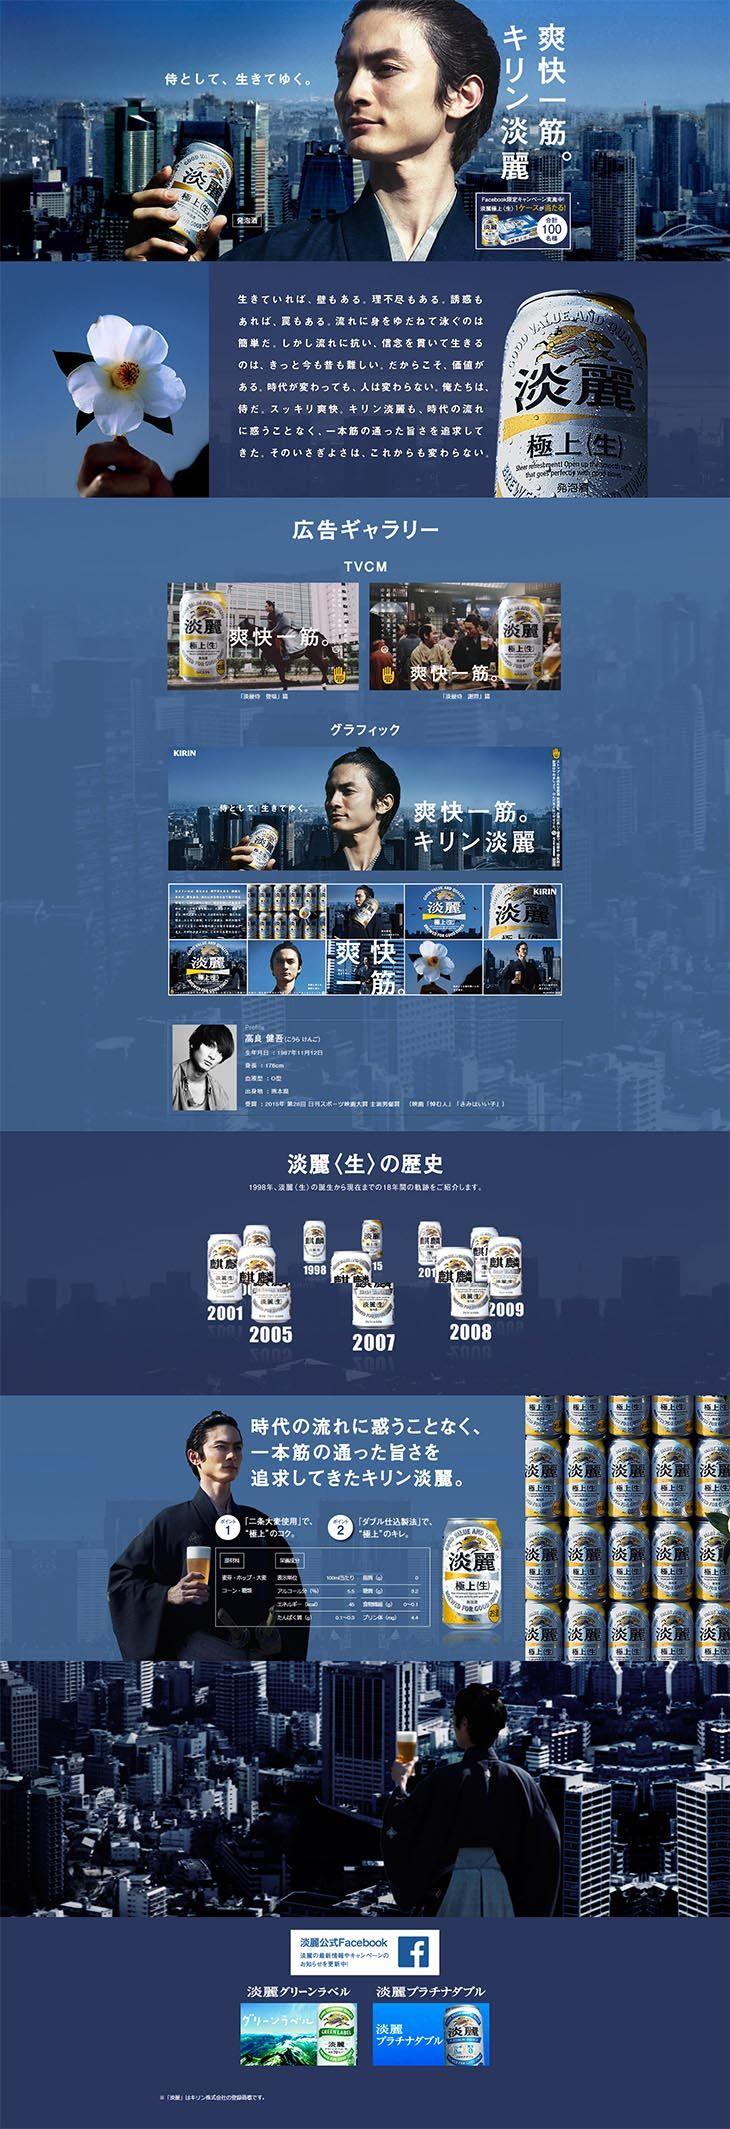 web design | KIRIN BEER - 淡麗極上